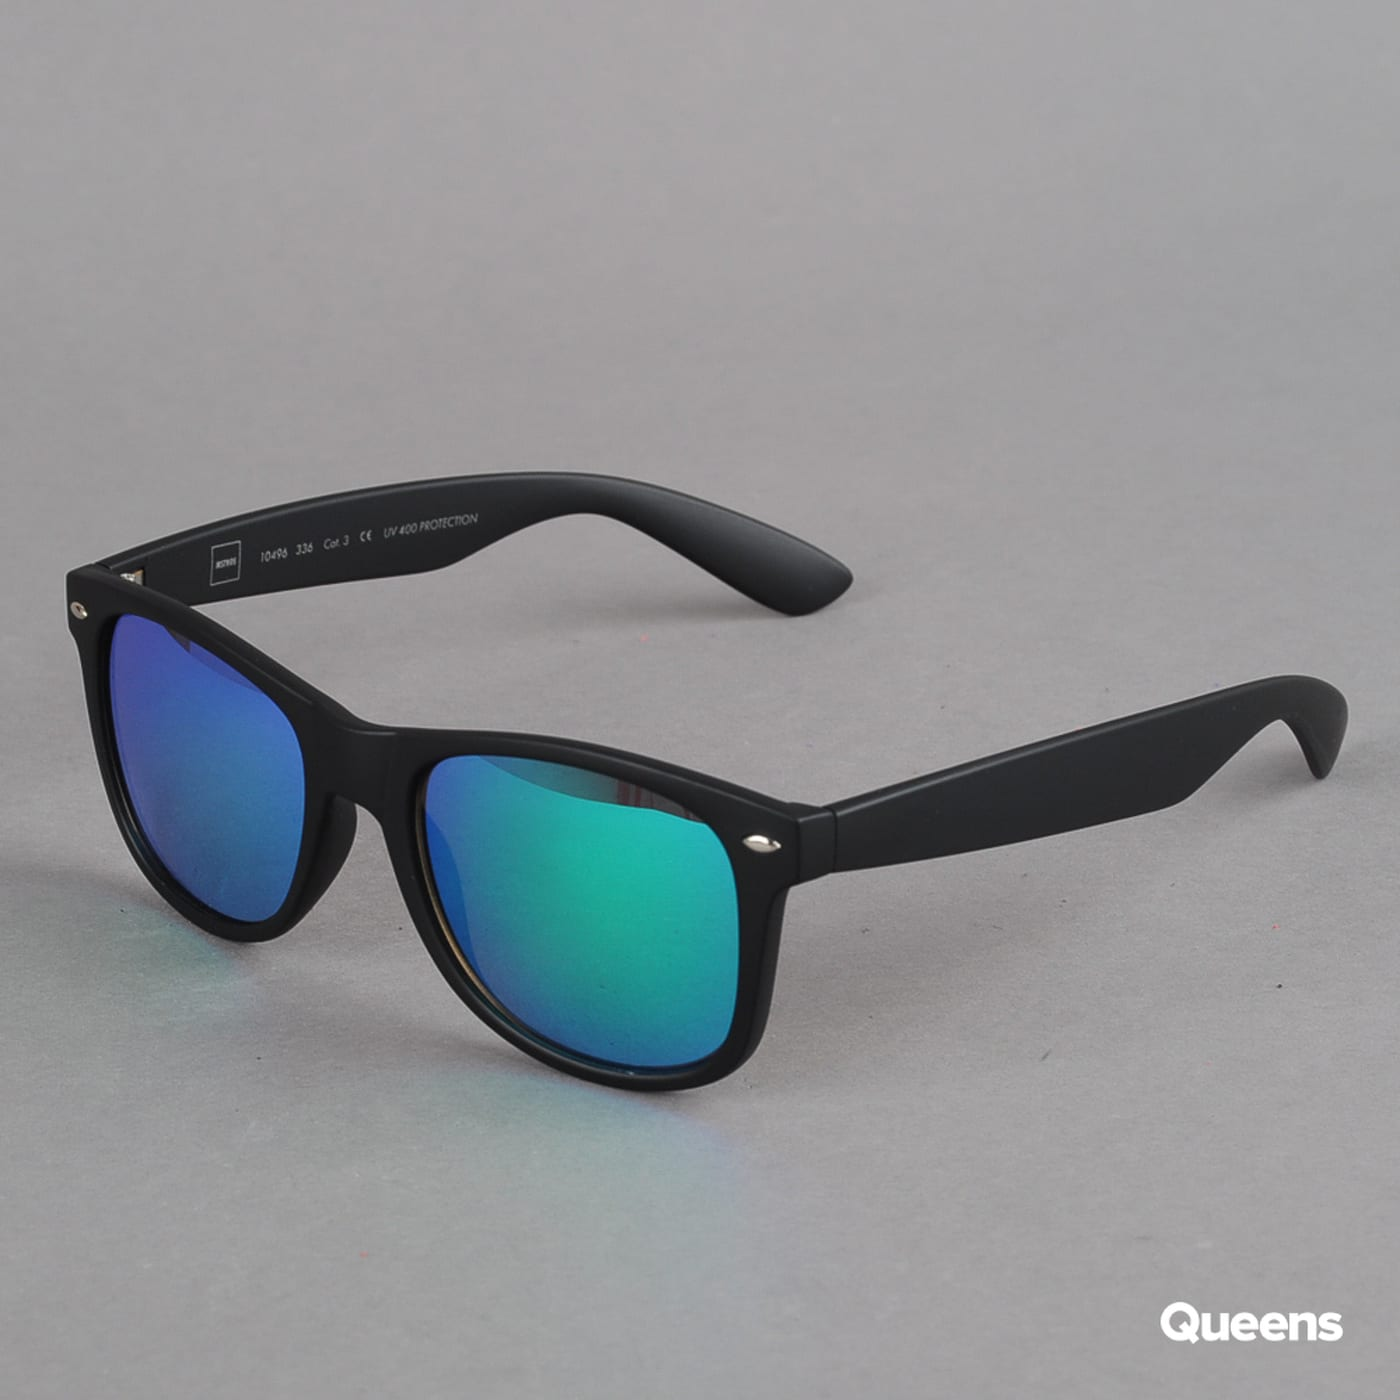 MD Sunglasses Likoma Mirror čierne / zelené